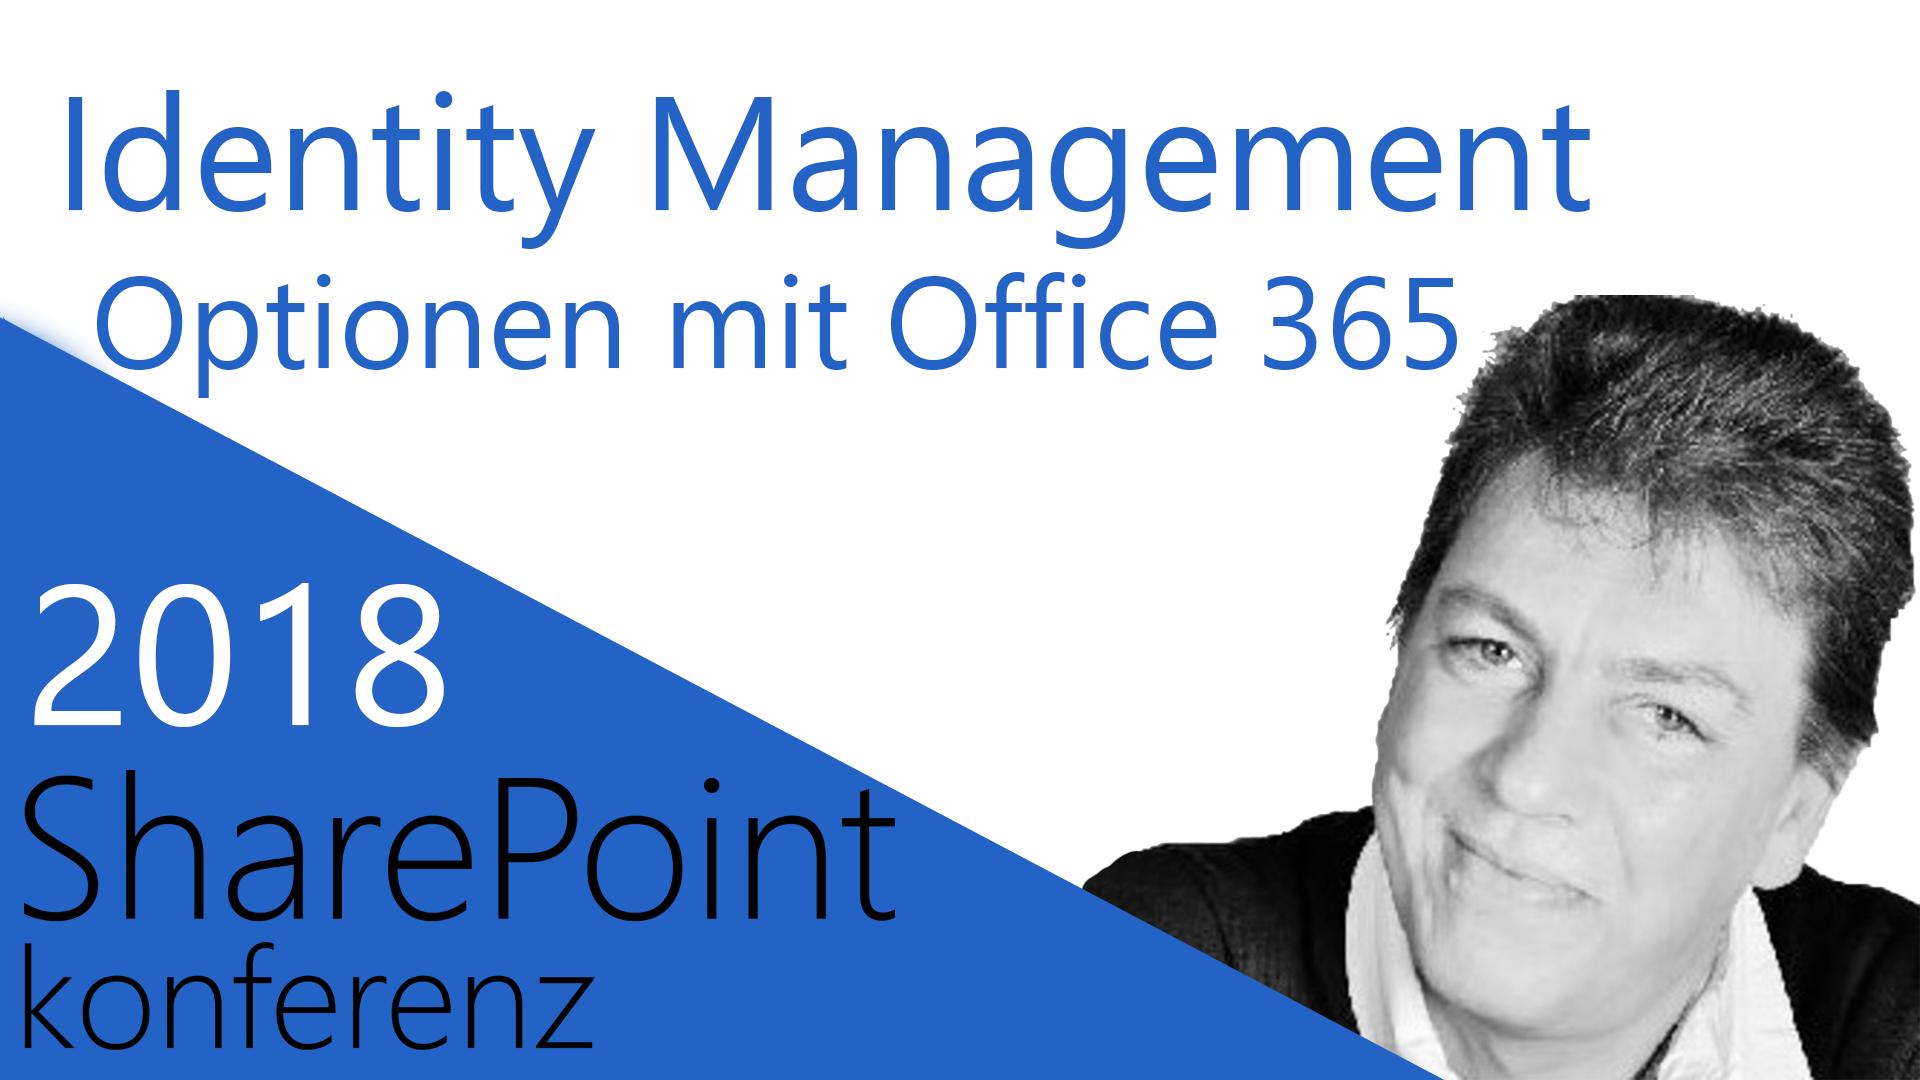 2018/SharePointKonferenz/identitymanagementoptionen